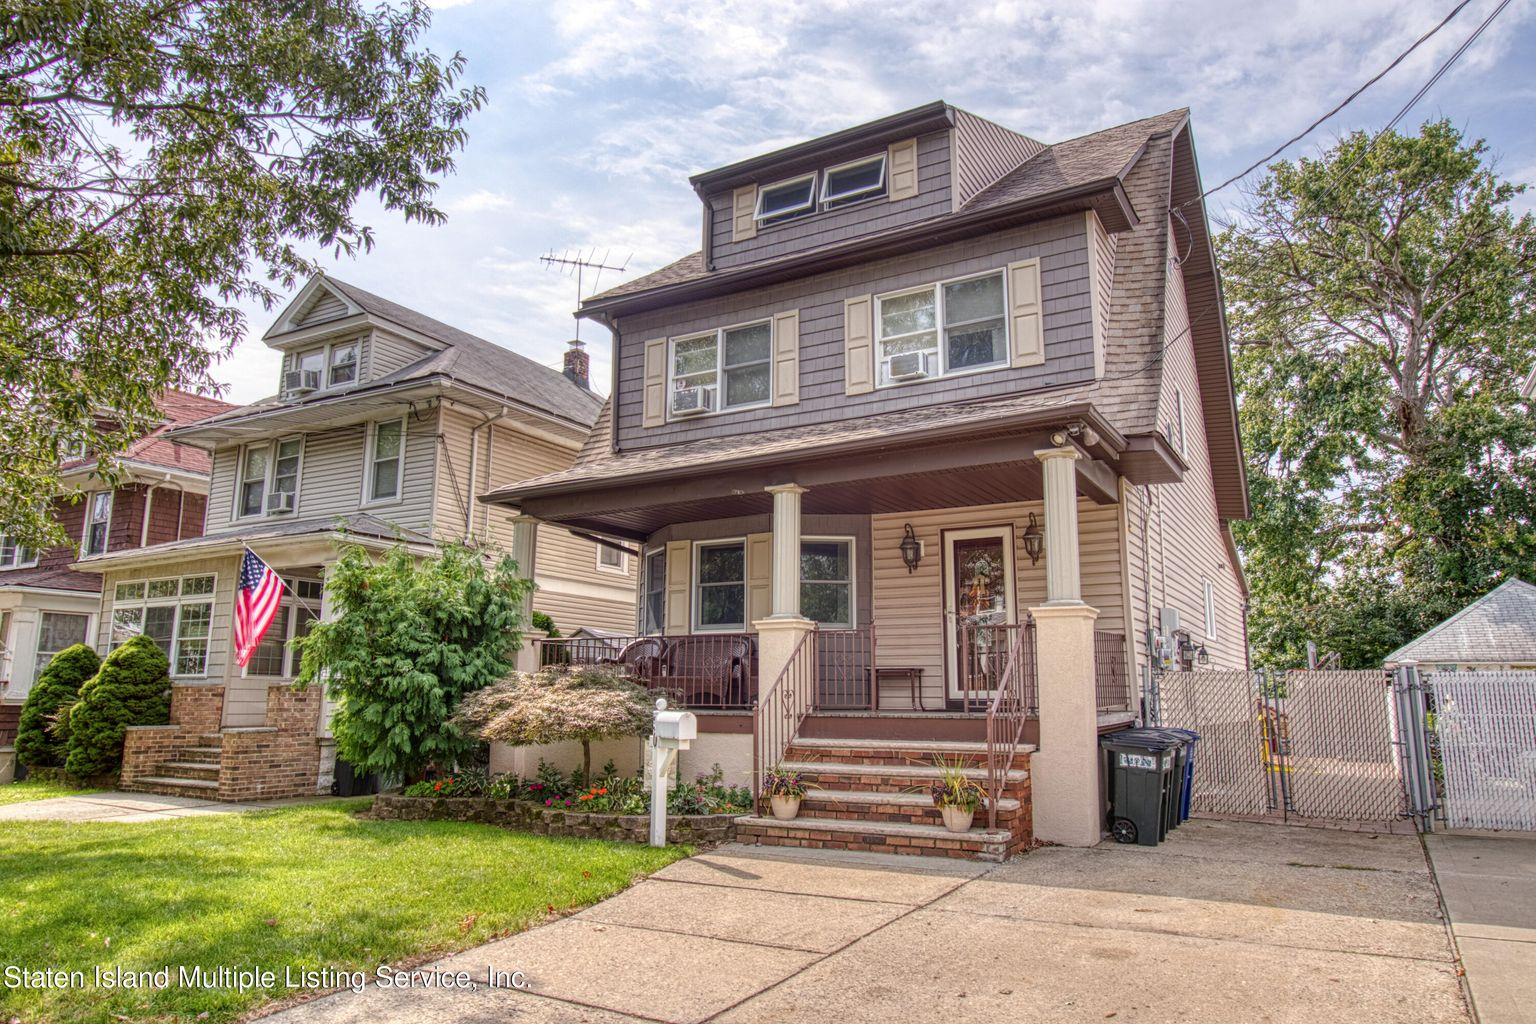 30 Homestead Avenue